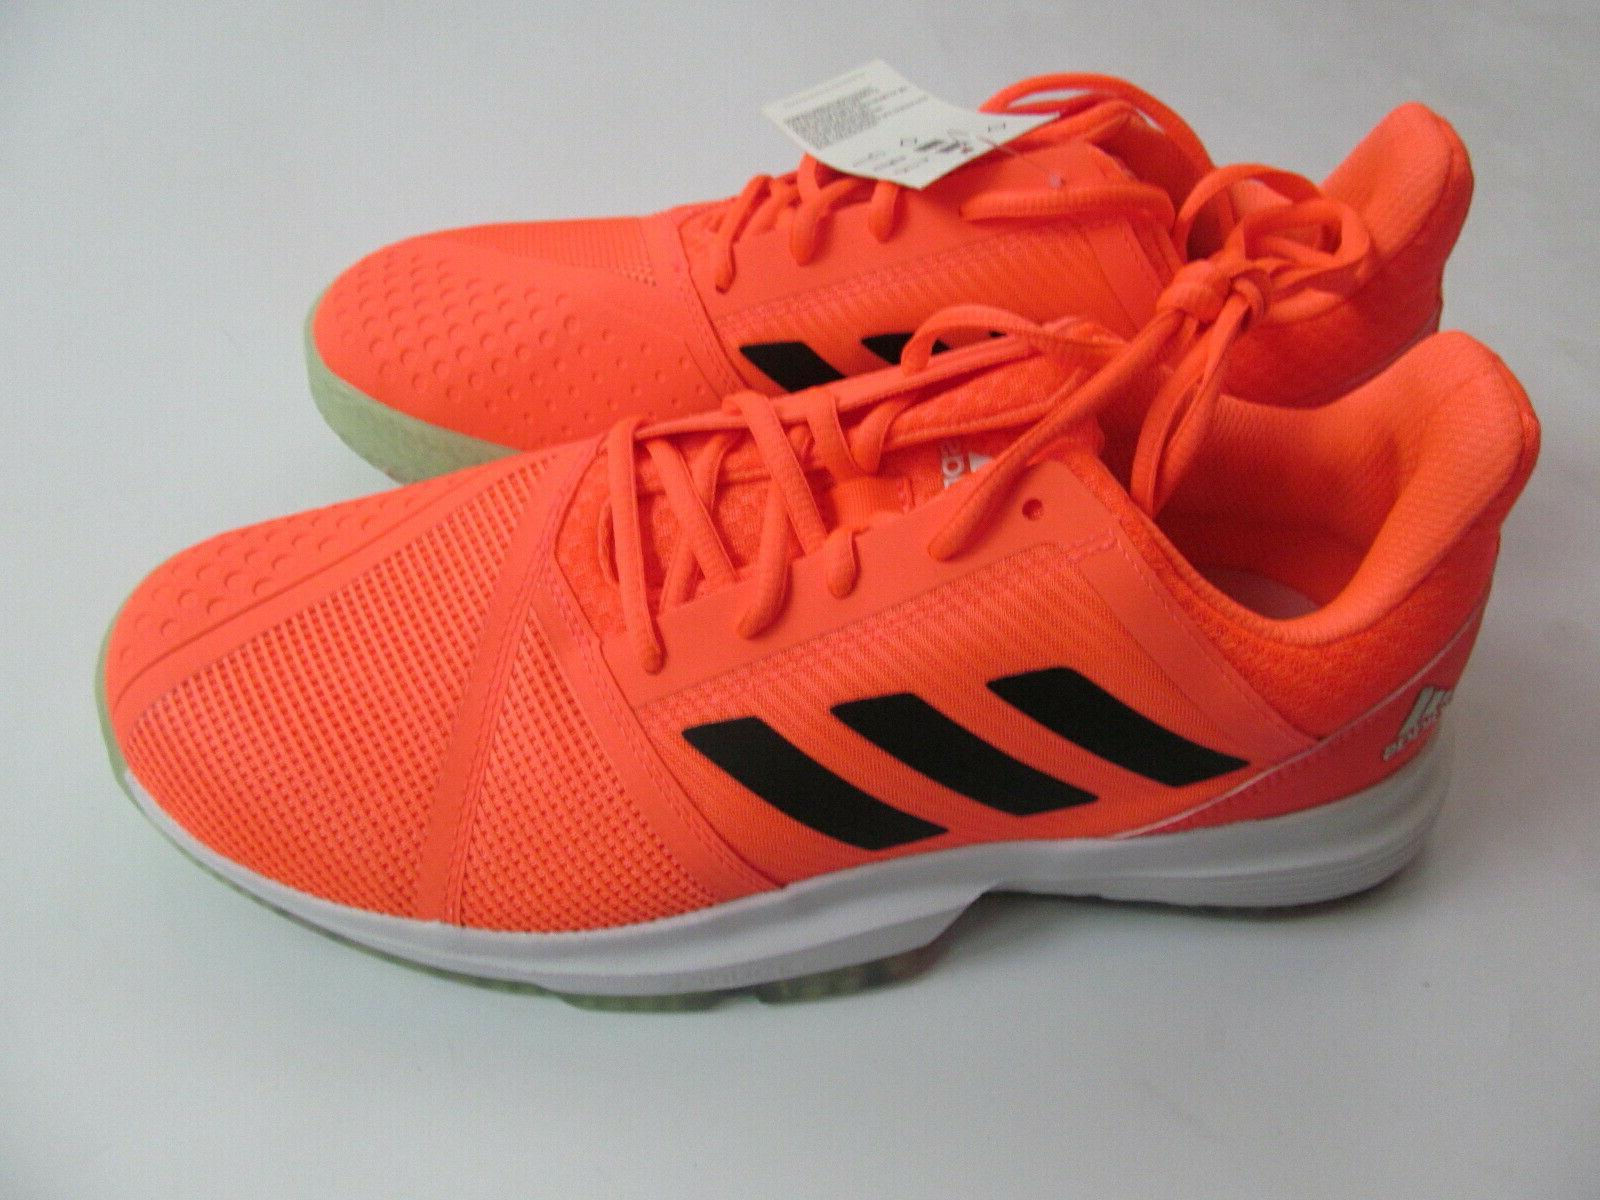 courtjam bounce tennis ef2478 man orange shoes